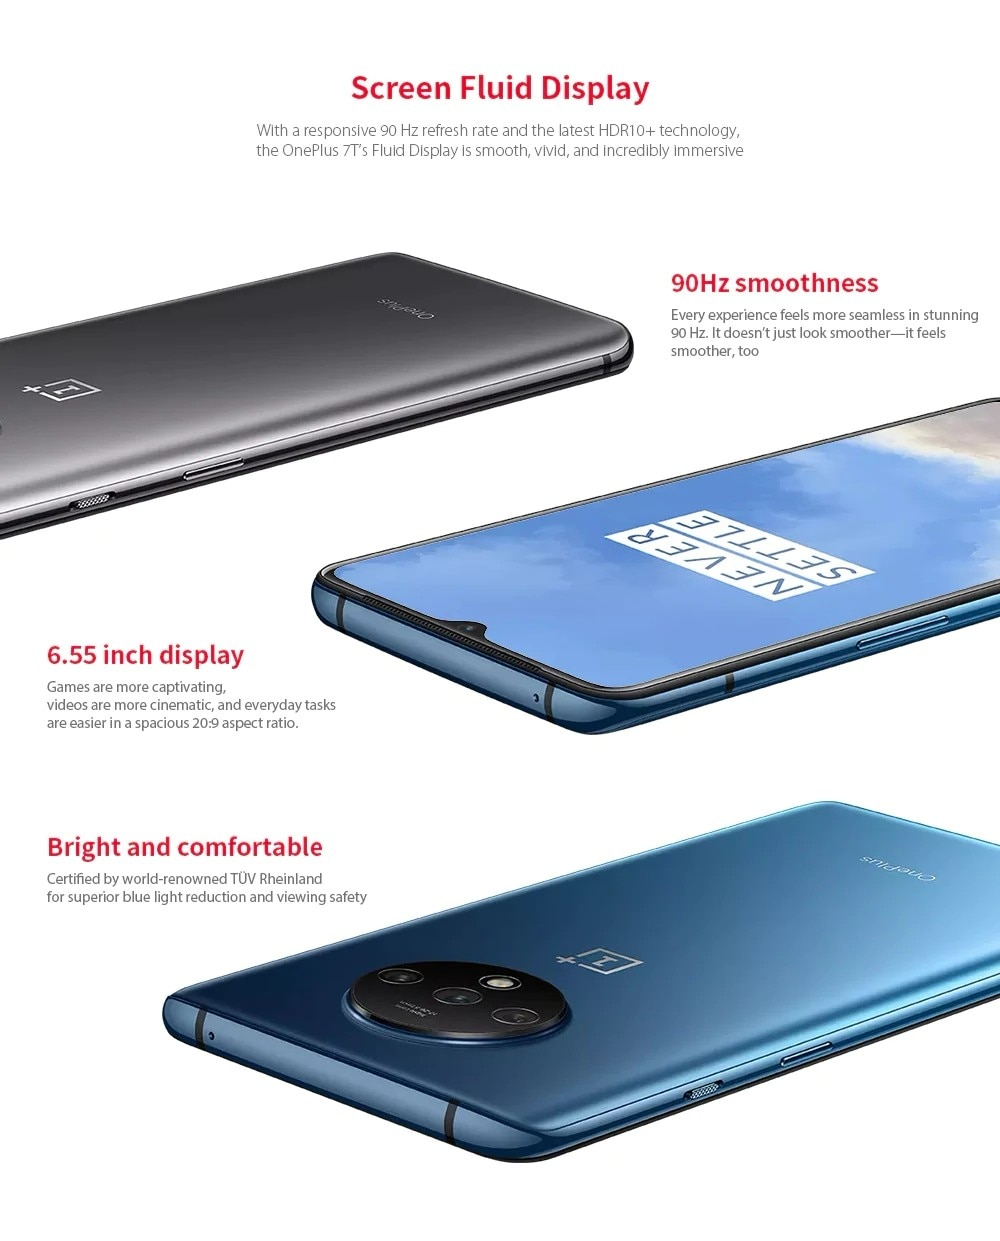 Oneplus 7T 4G Phablet 8GB RAM 256GB ROM - Blue Gray